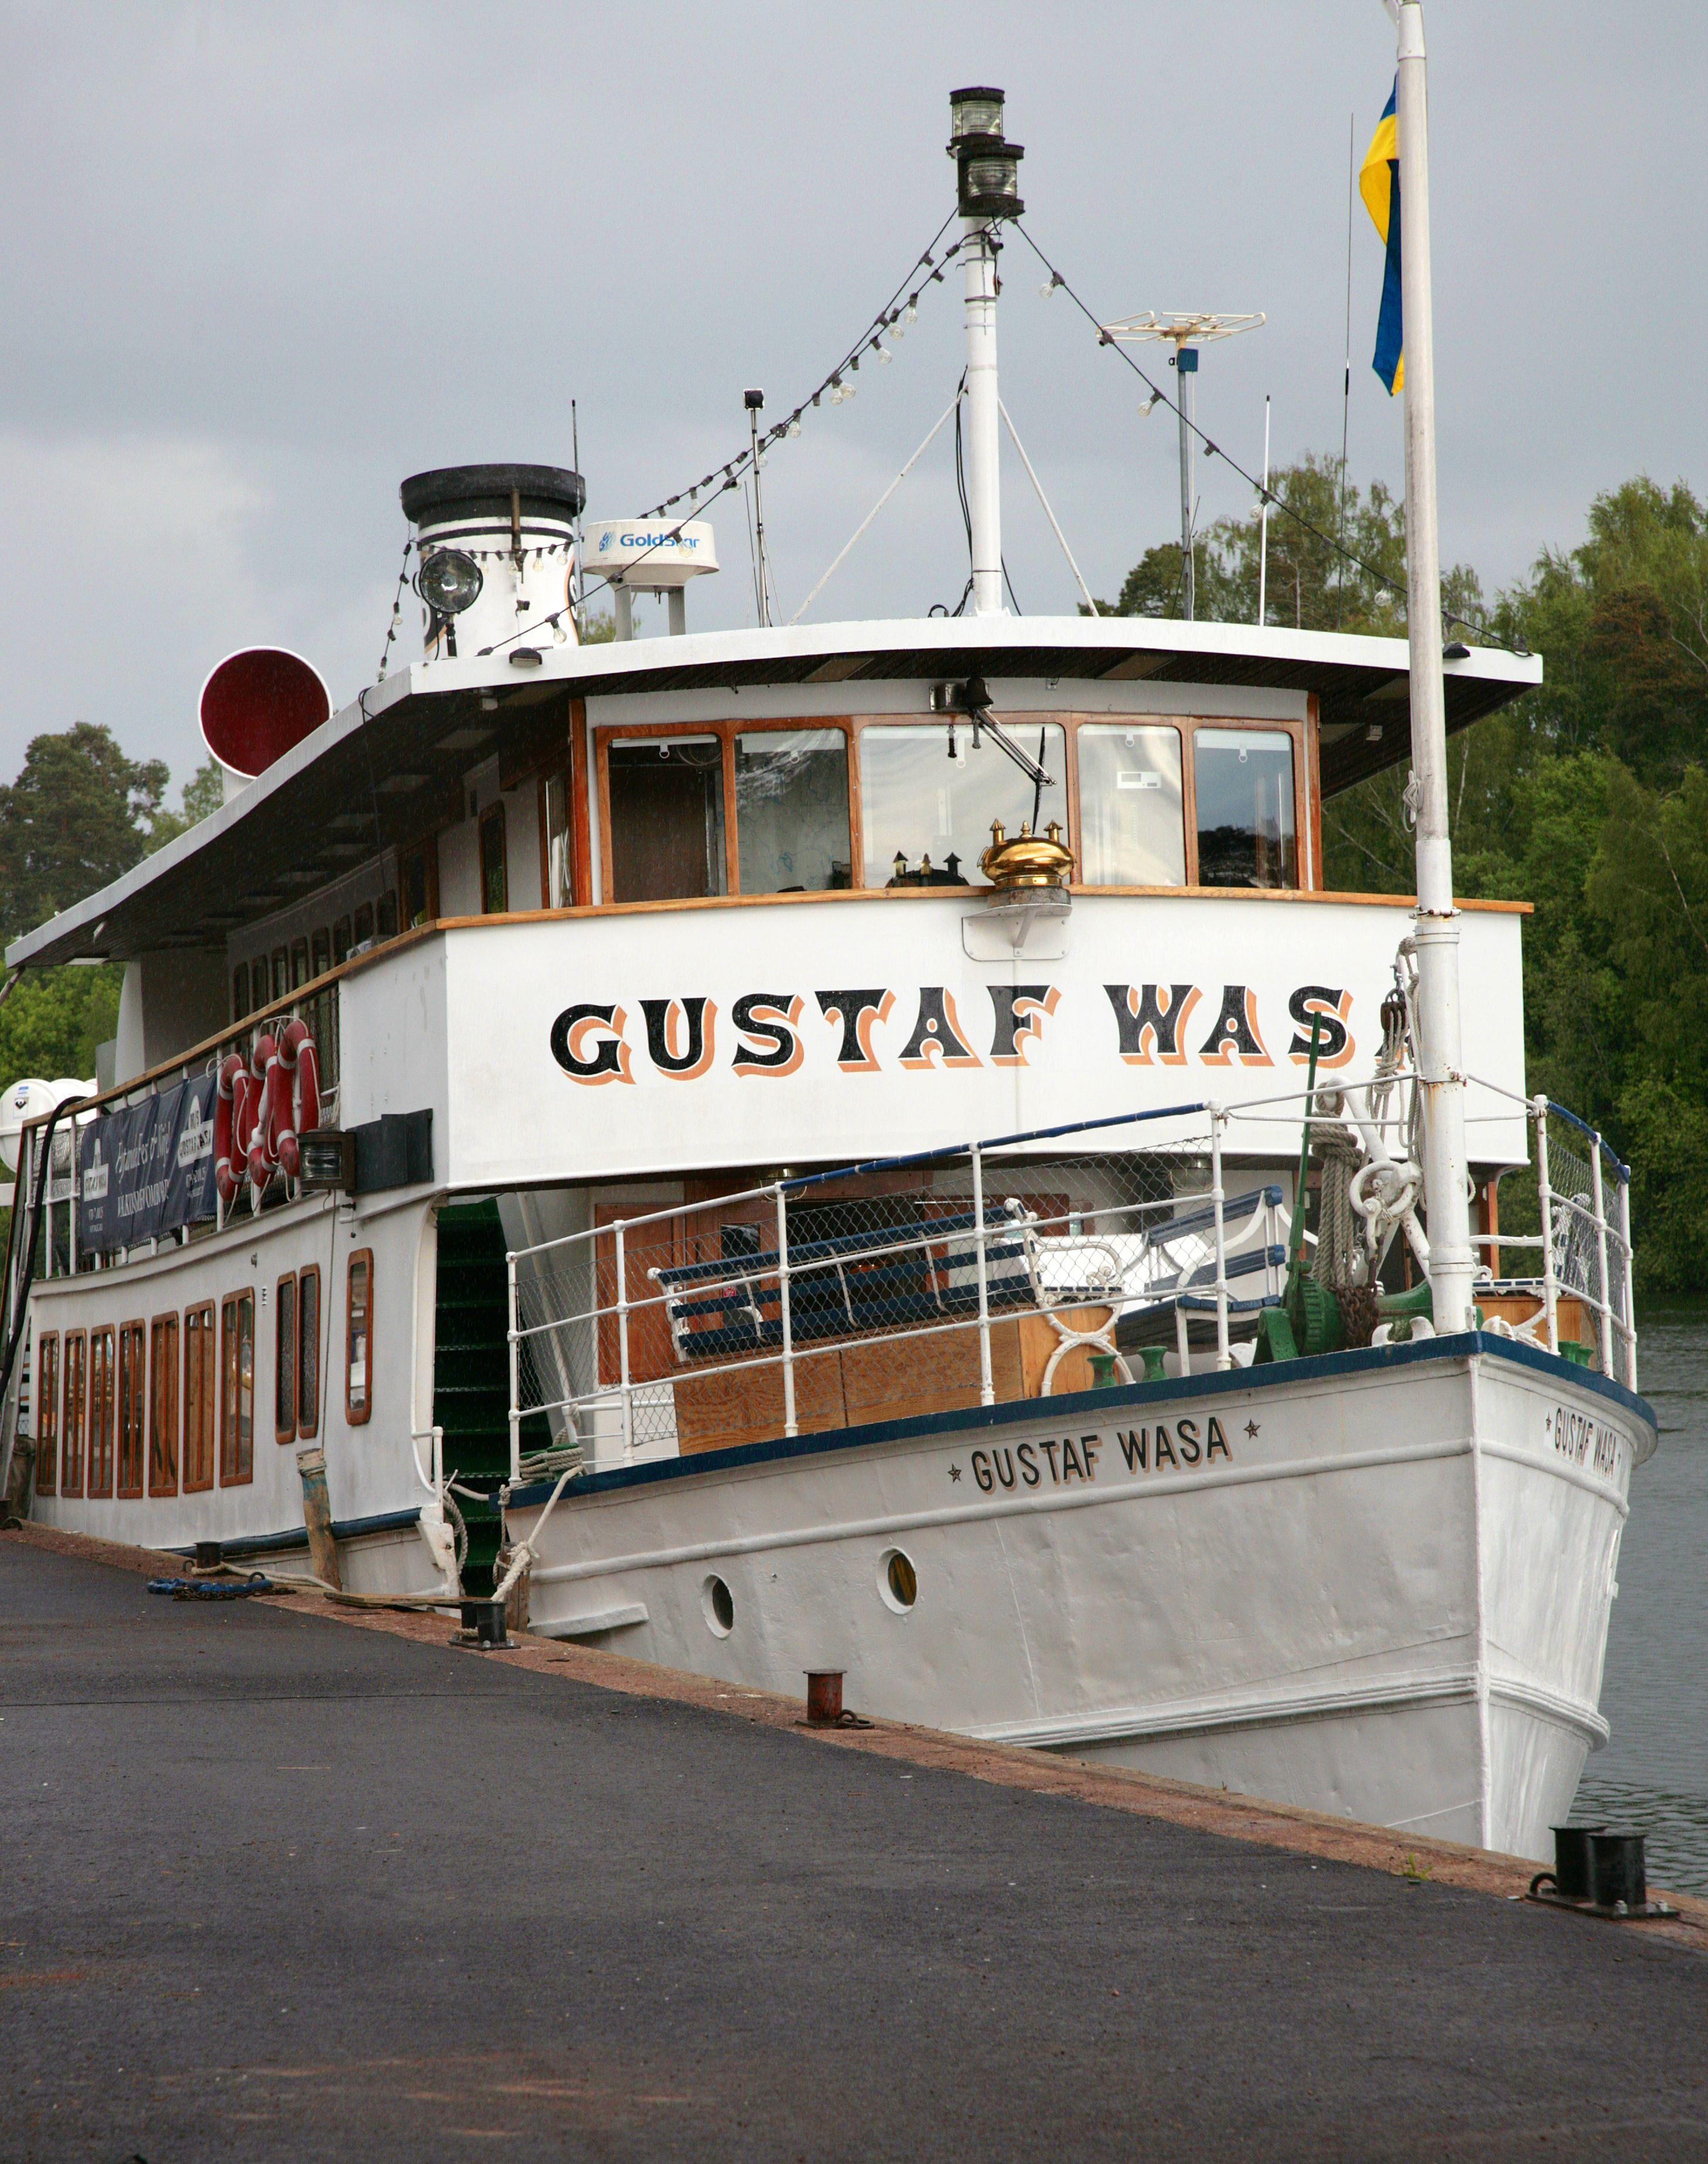 M/S Gustaf Wasa, kryssning